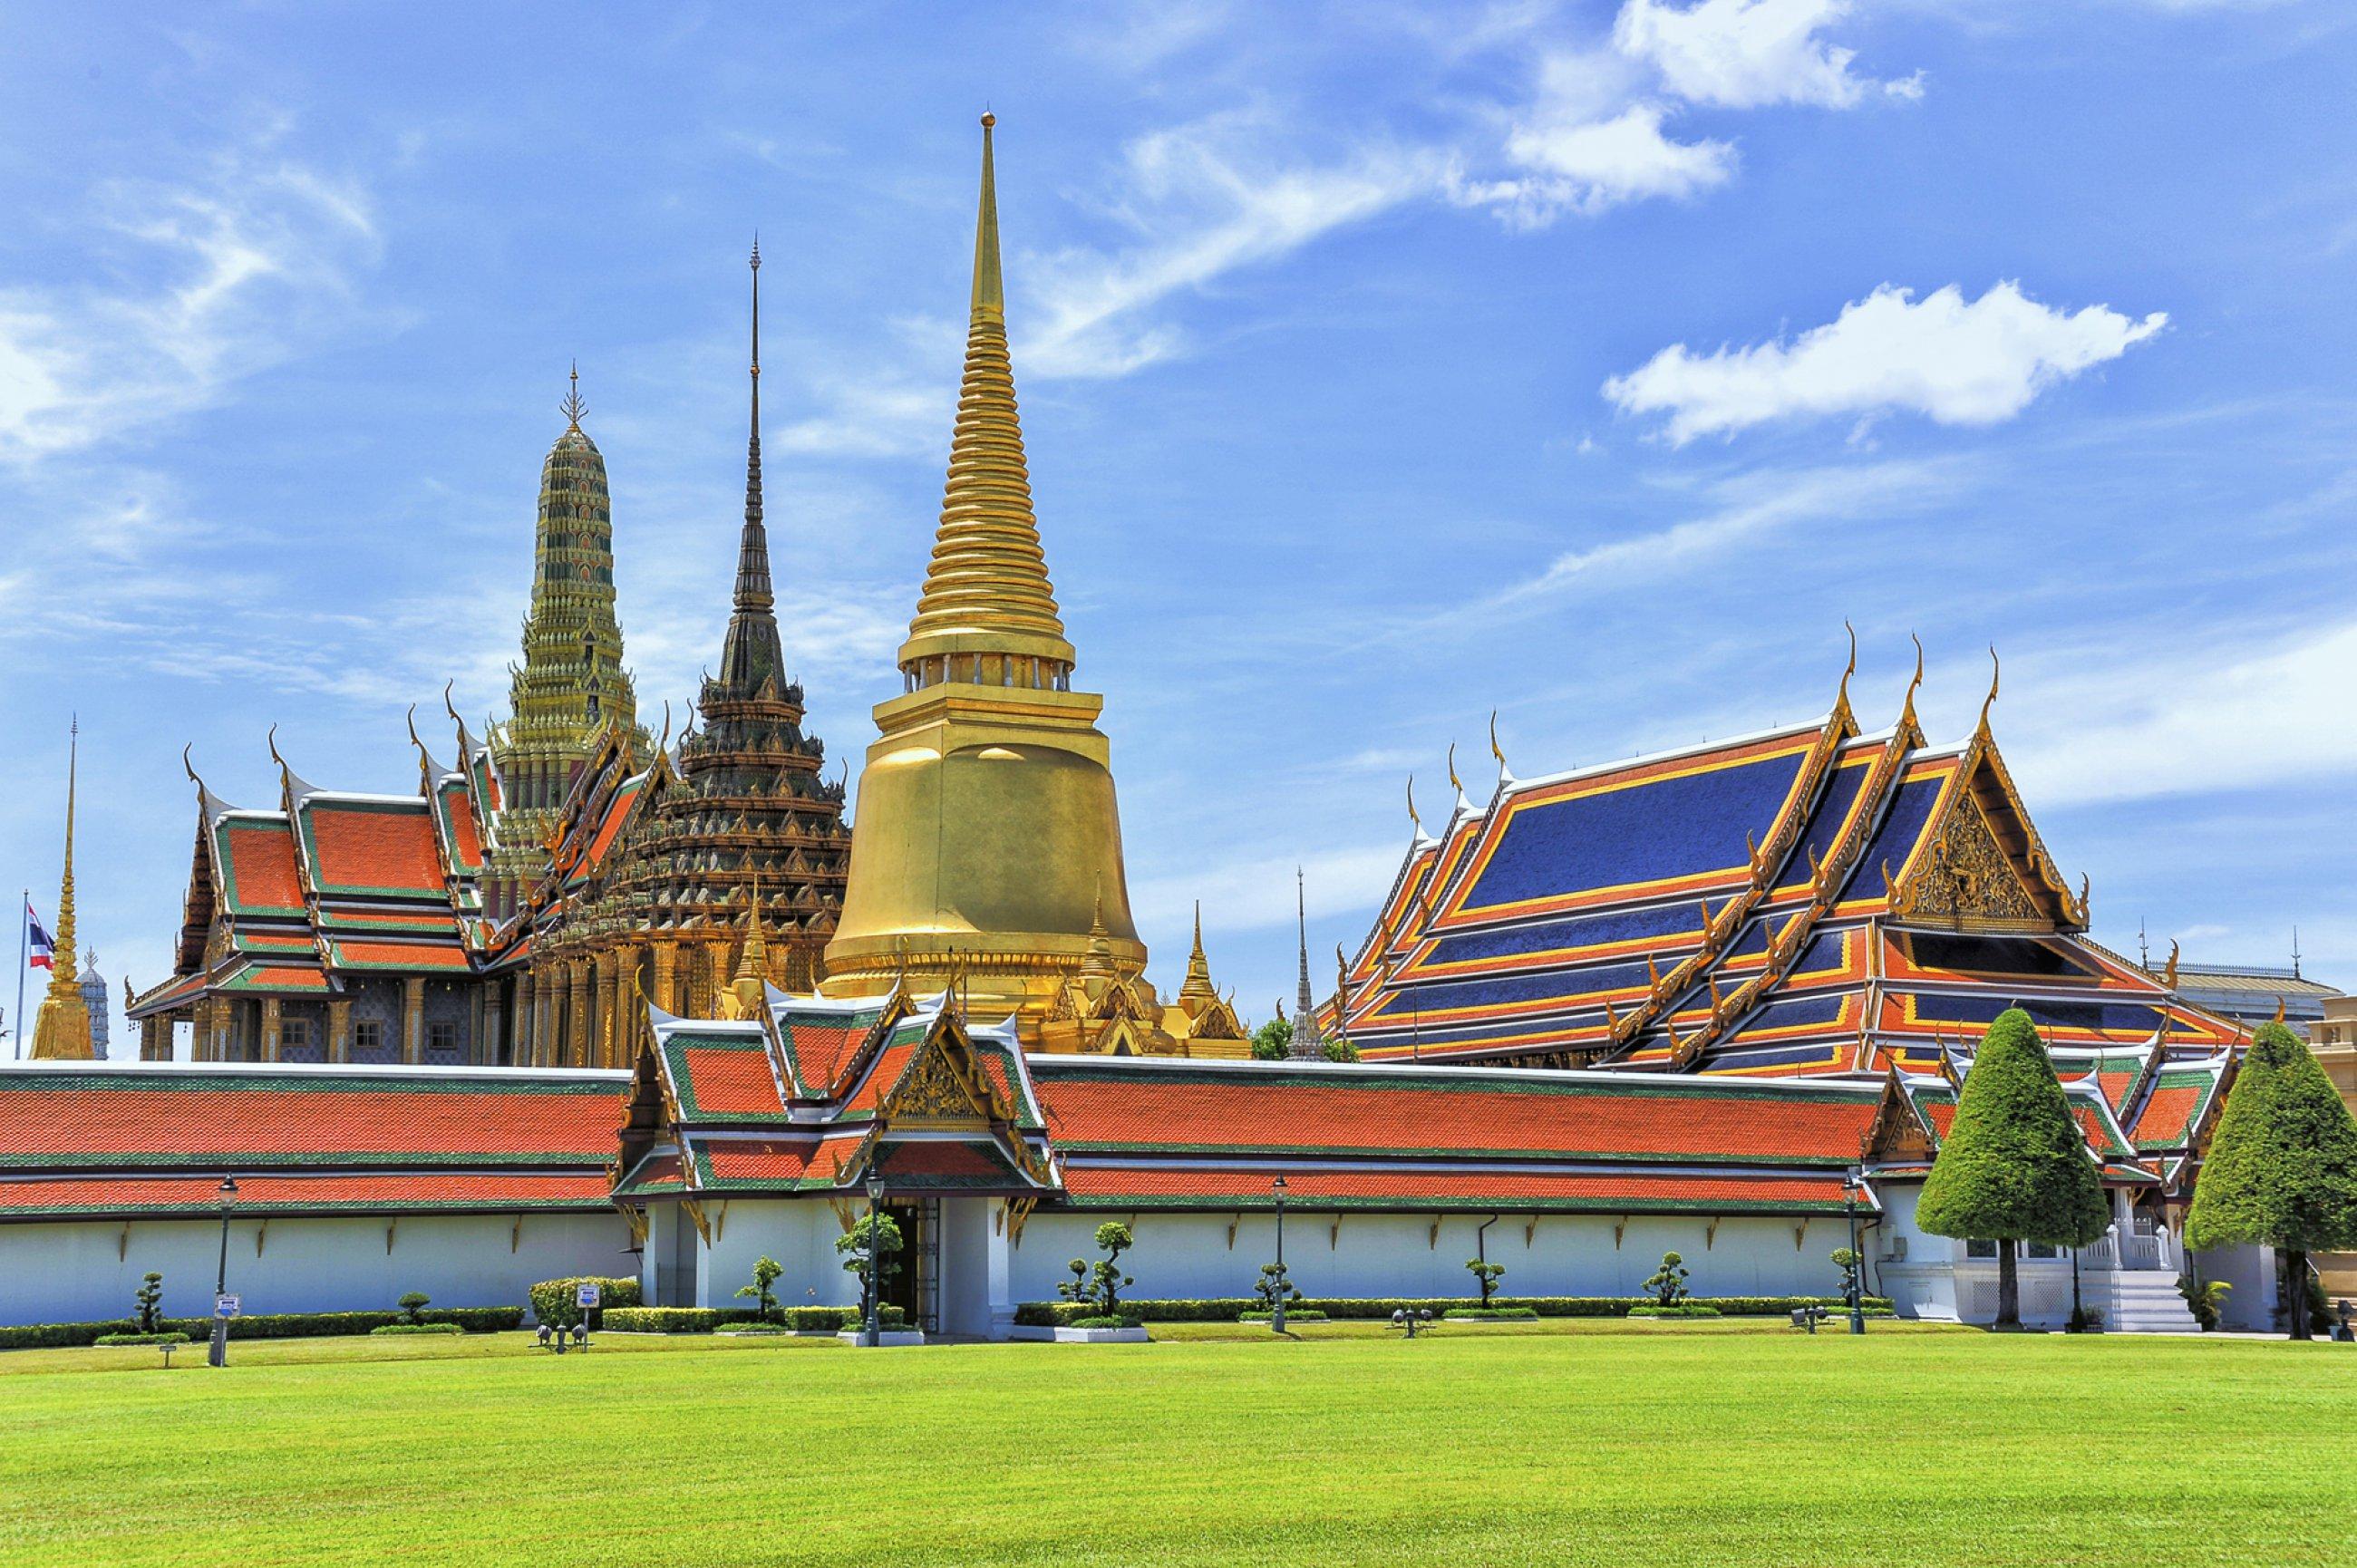 https://bubo.sk/uploads/galleries/5064/bkk-bangkok-dreamstime-xl-42485181-2-.jpg